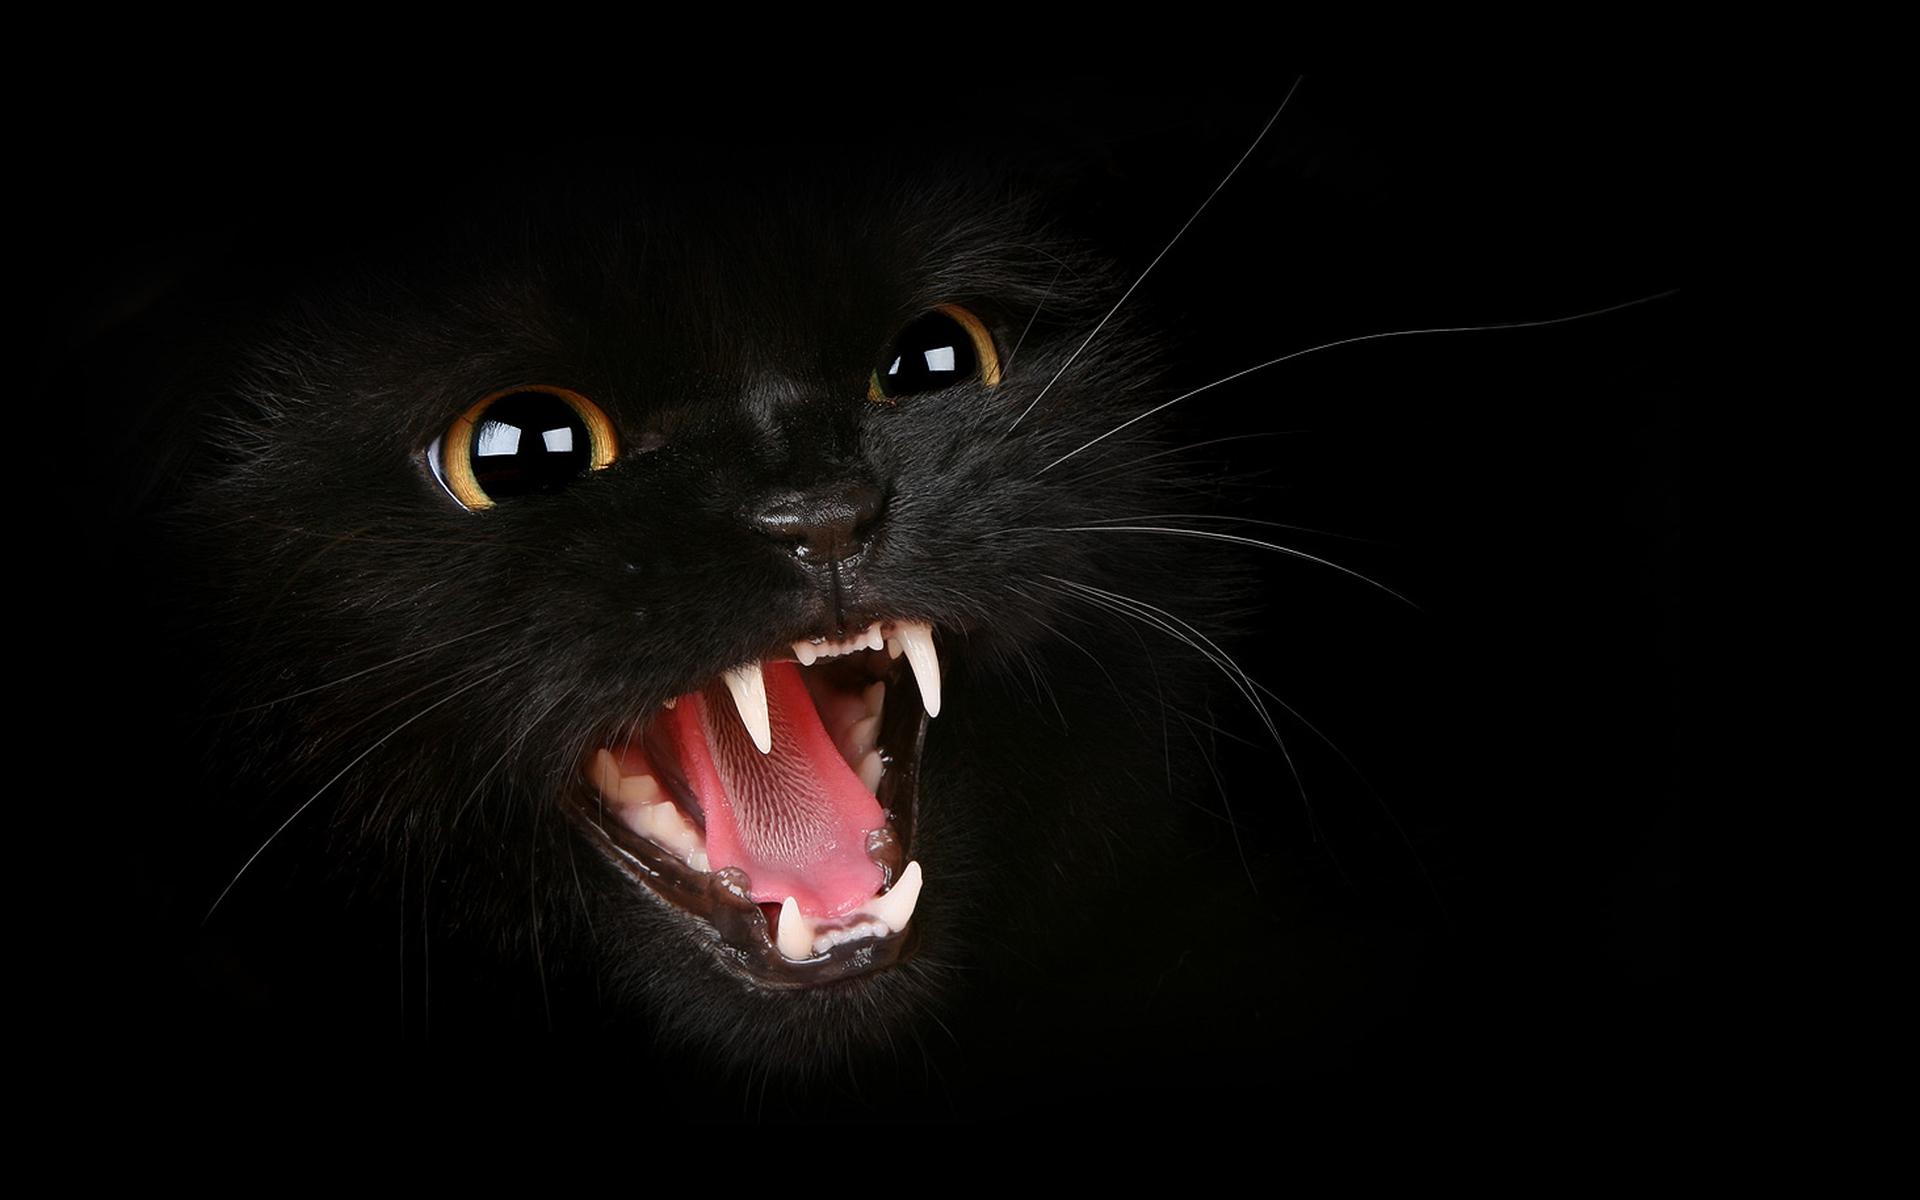 Black Cat HD Wallpaper Black Cat Images Cool Wallpapers 1920x1200